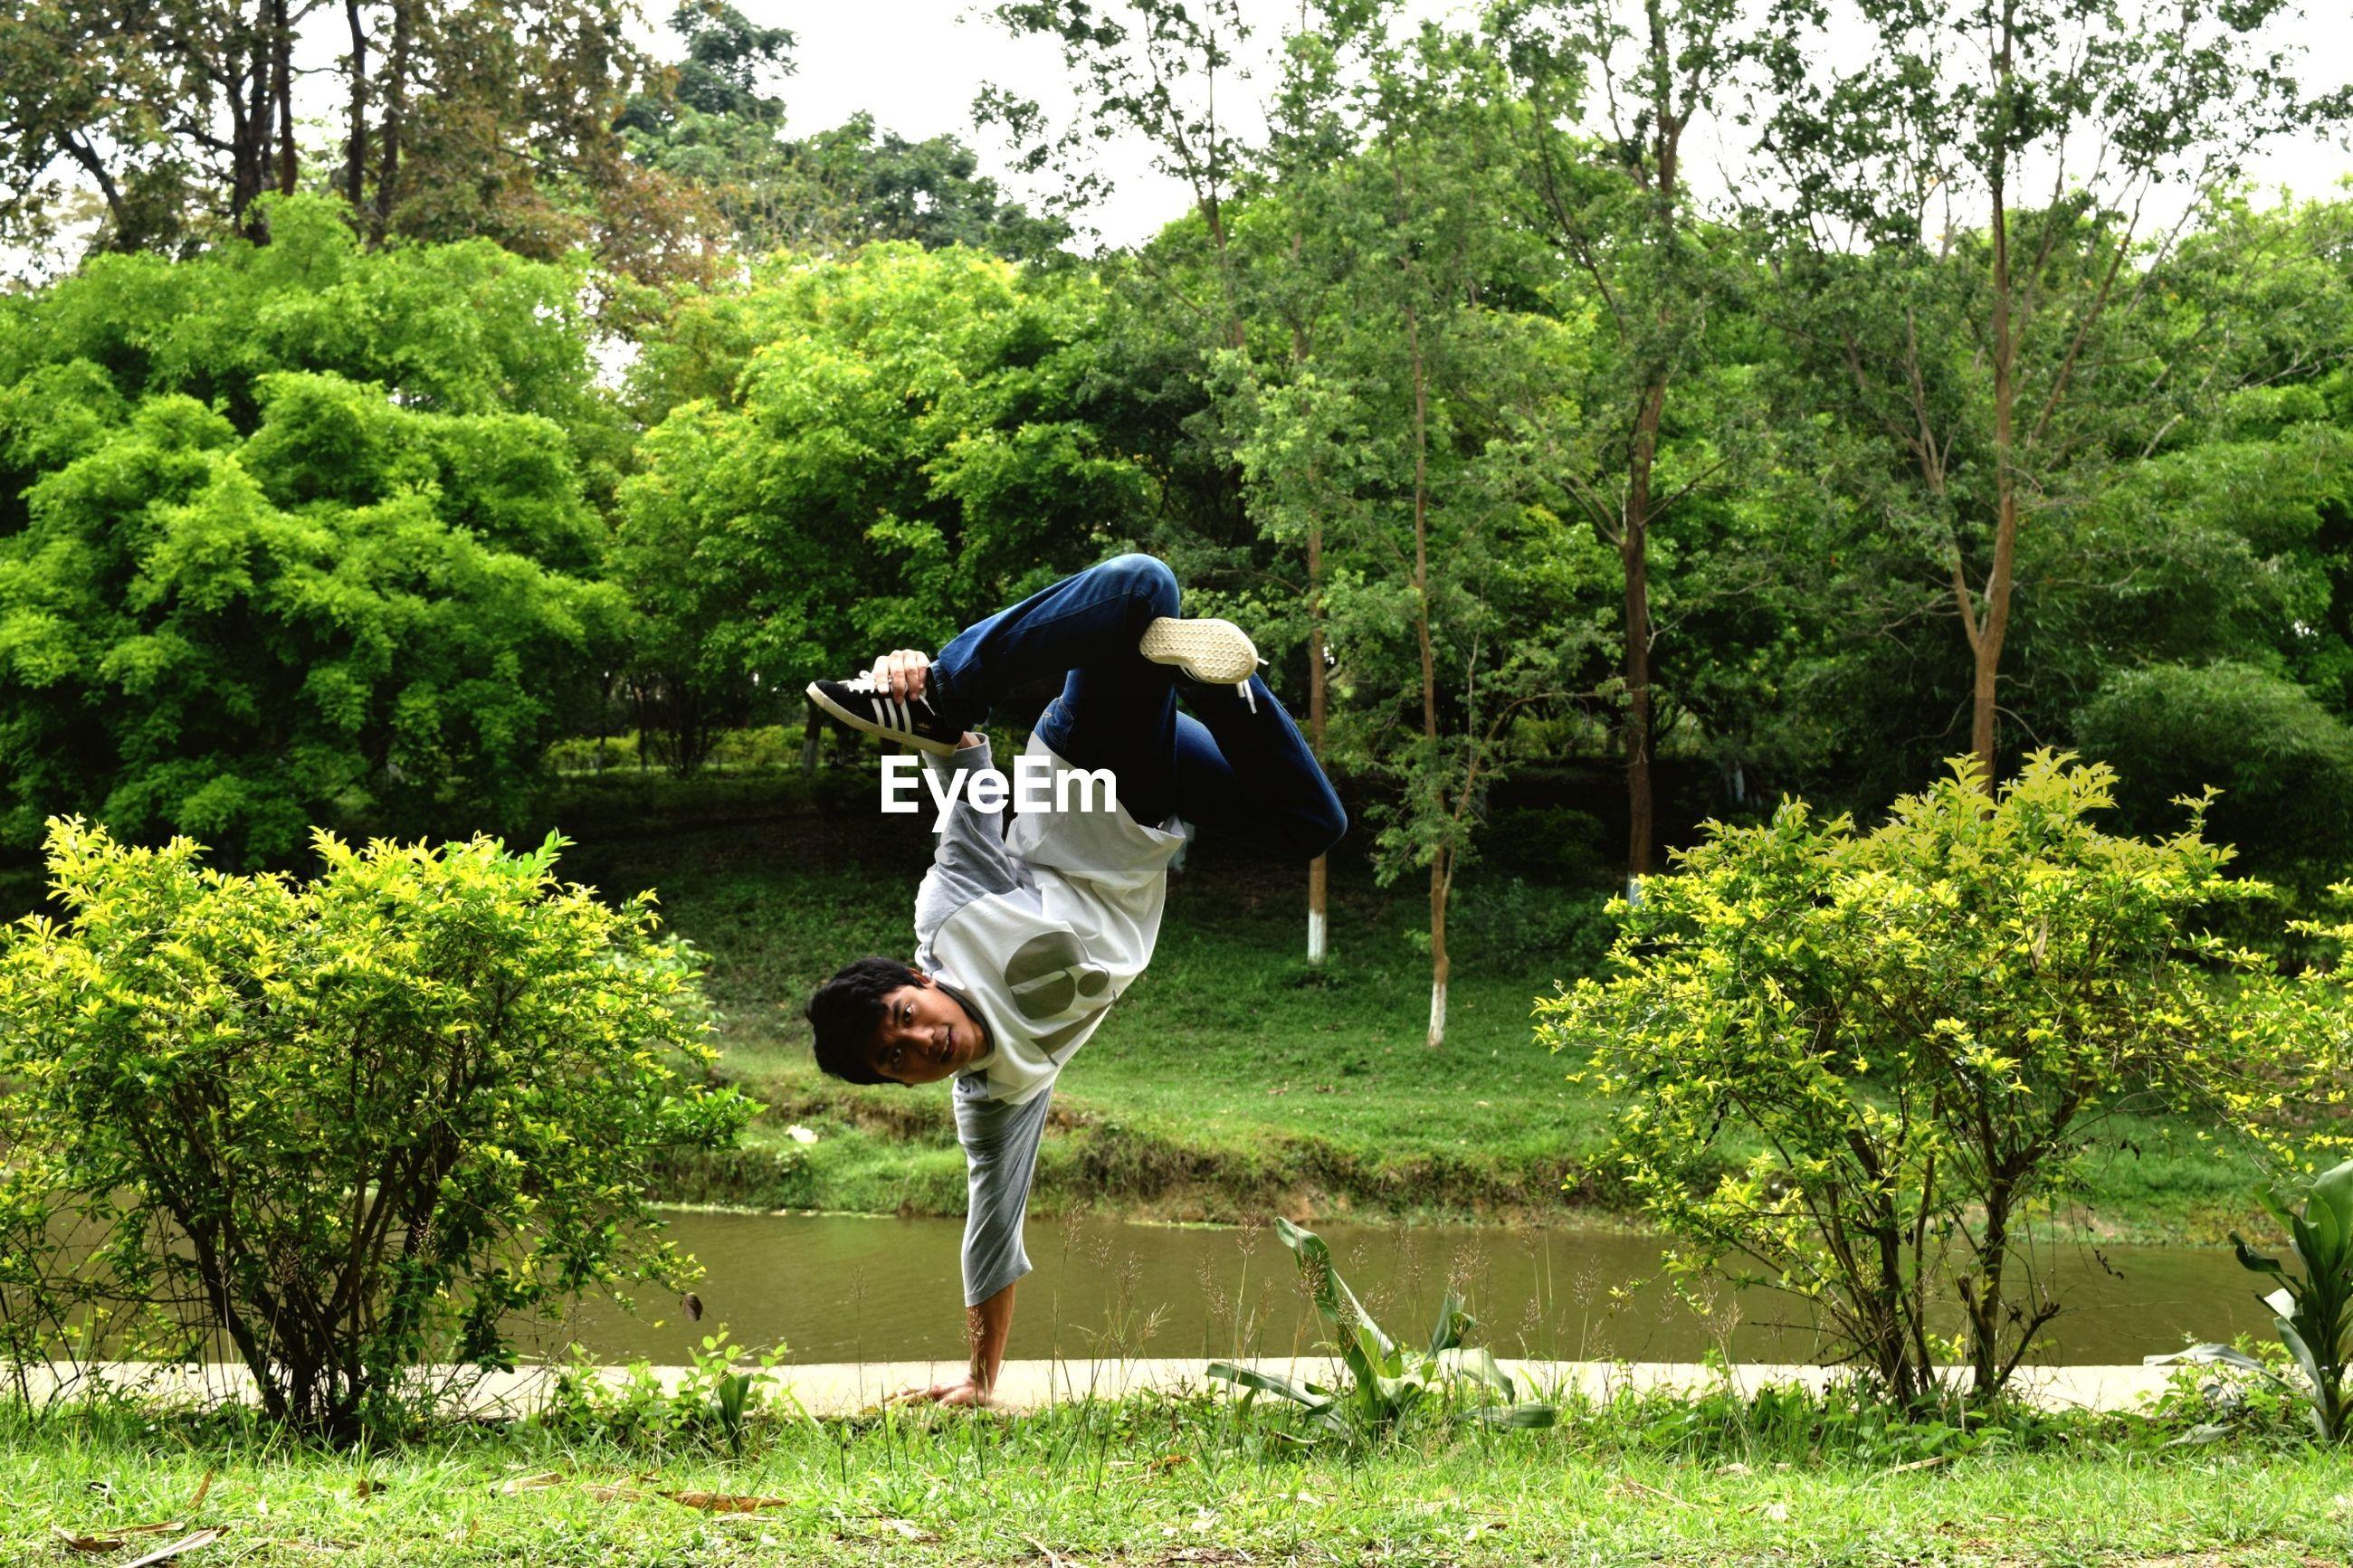 Man practicing stunt against trees in park